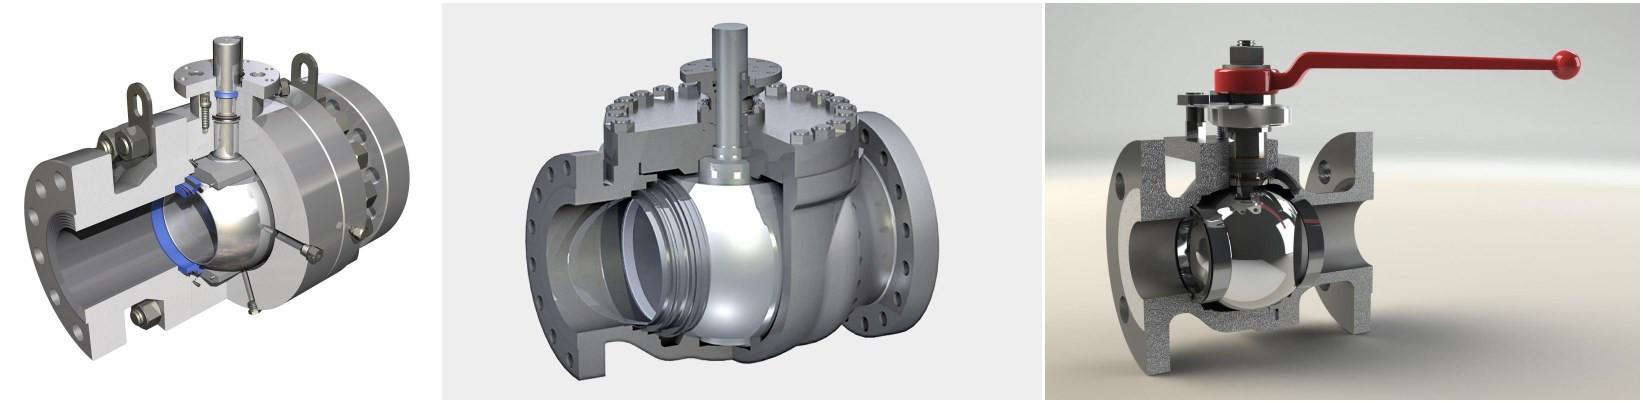 Optimum efficiency ball valve machine for machining a sphere